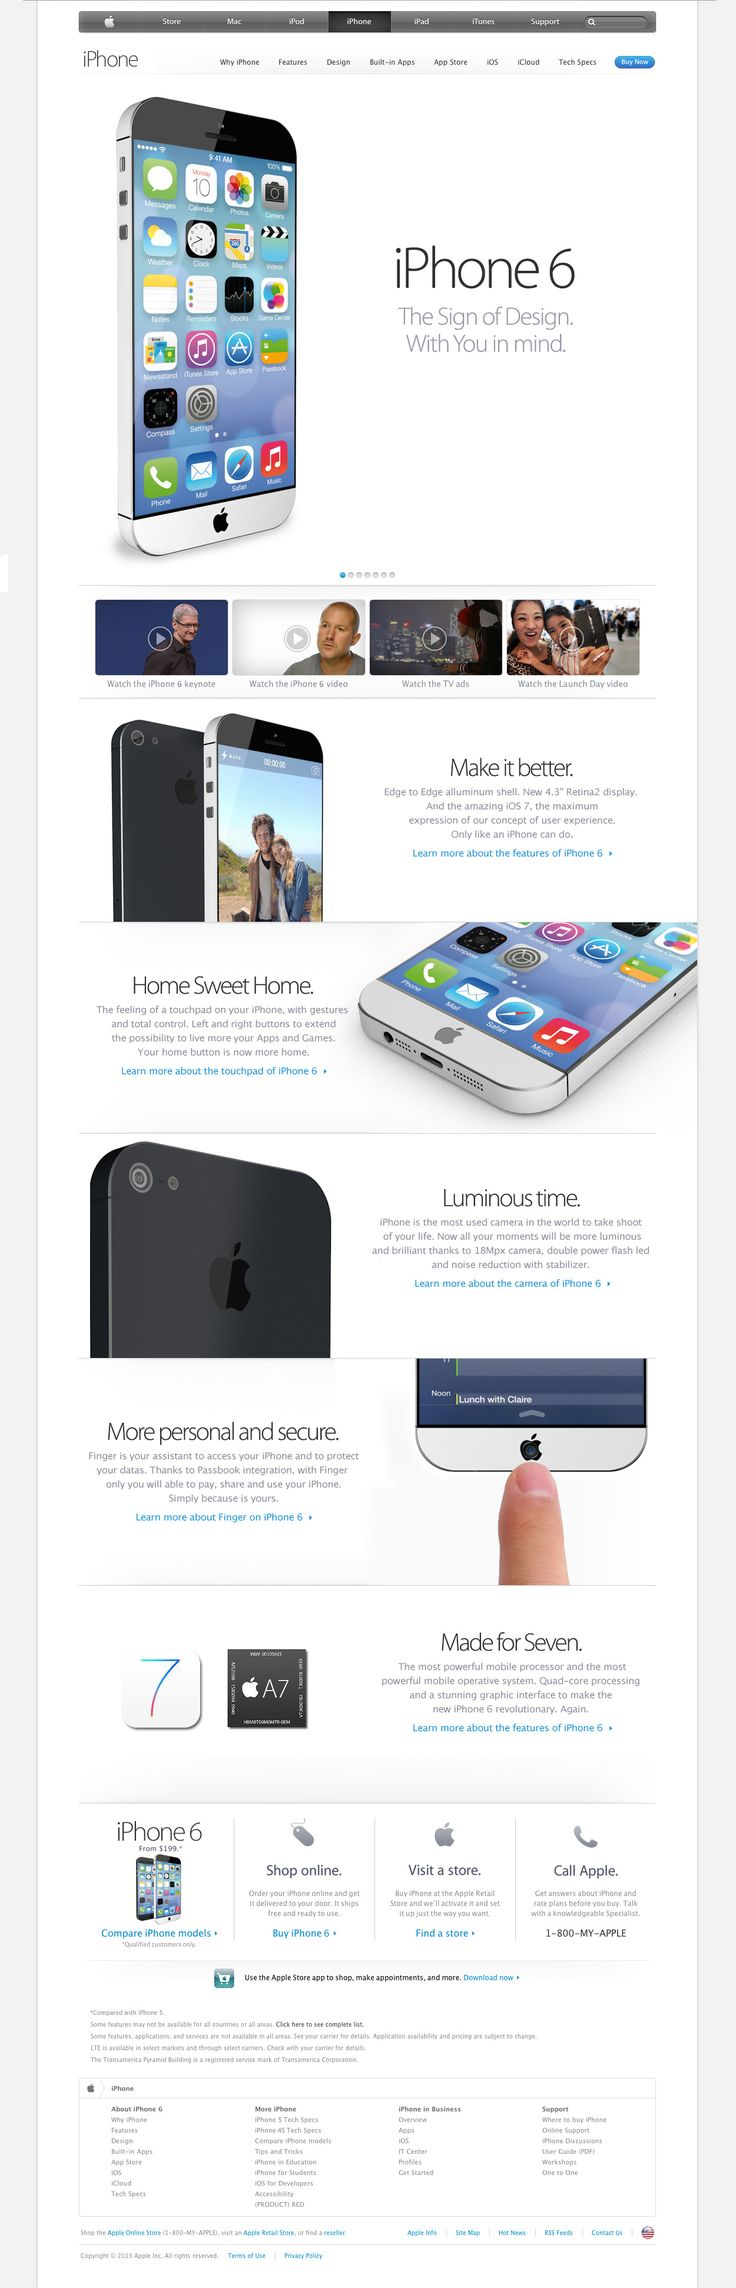 Rumor: iPhone 6 concept with iOS 7